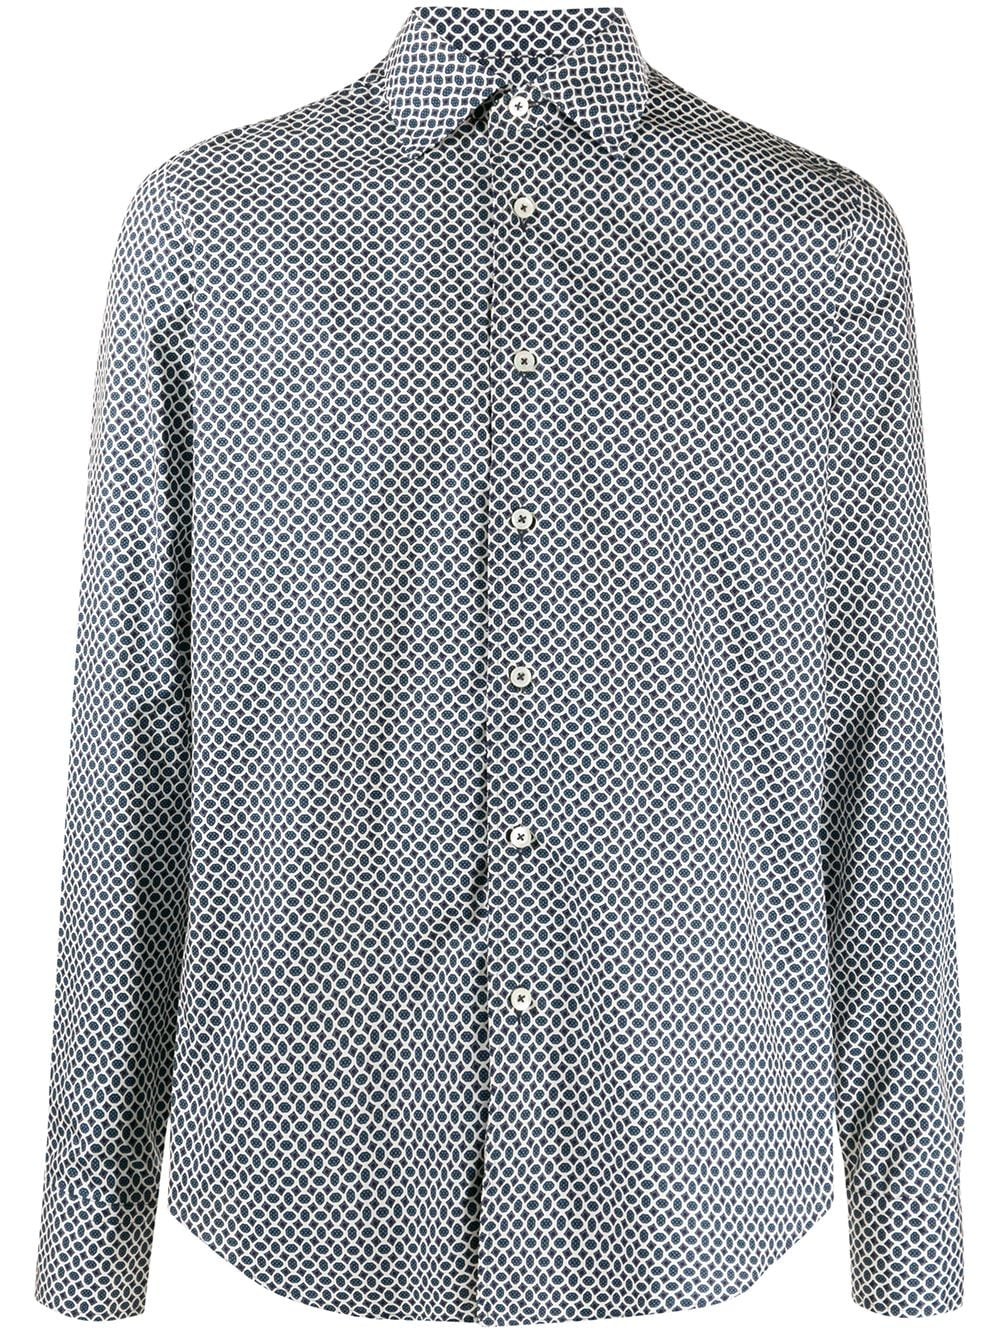 Dell'oglio Overhemd met geometrische print – Blauw